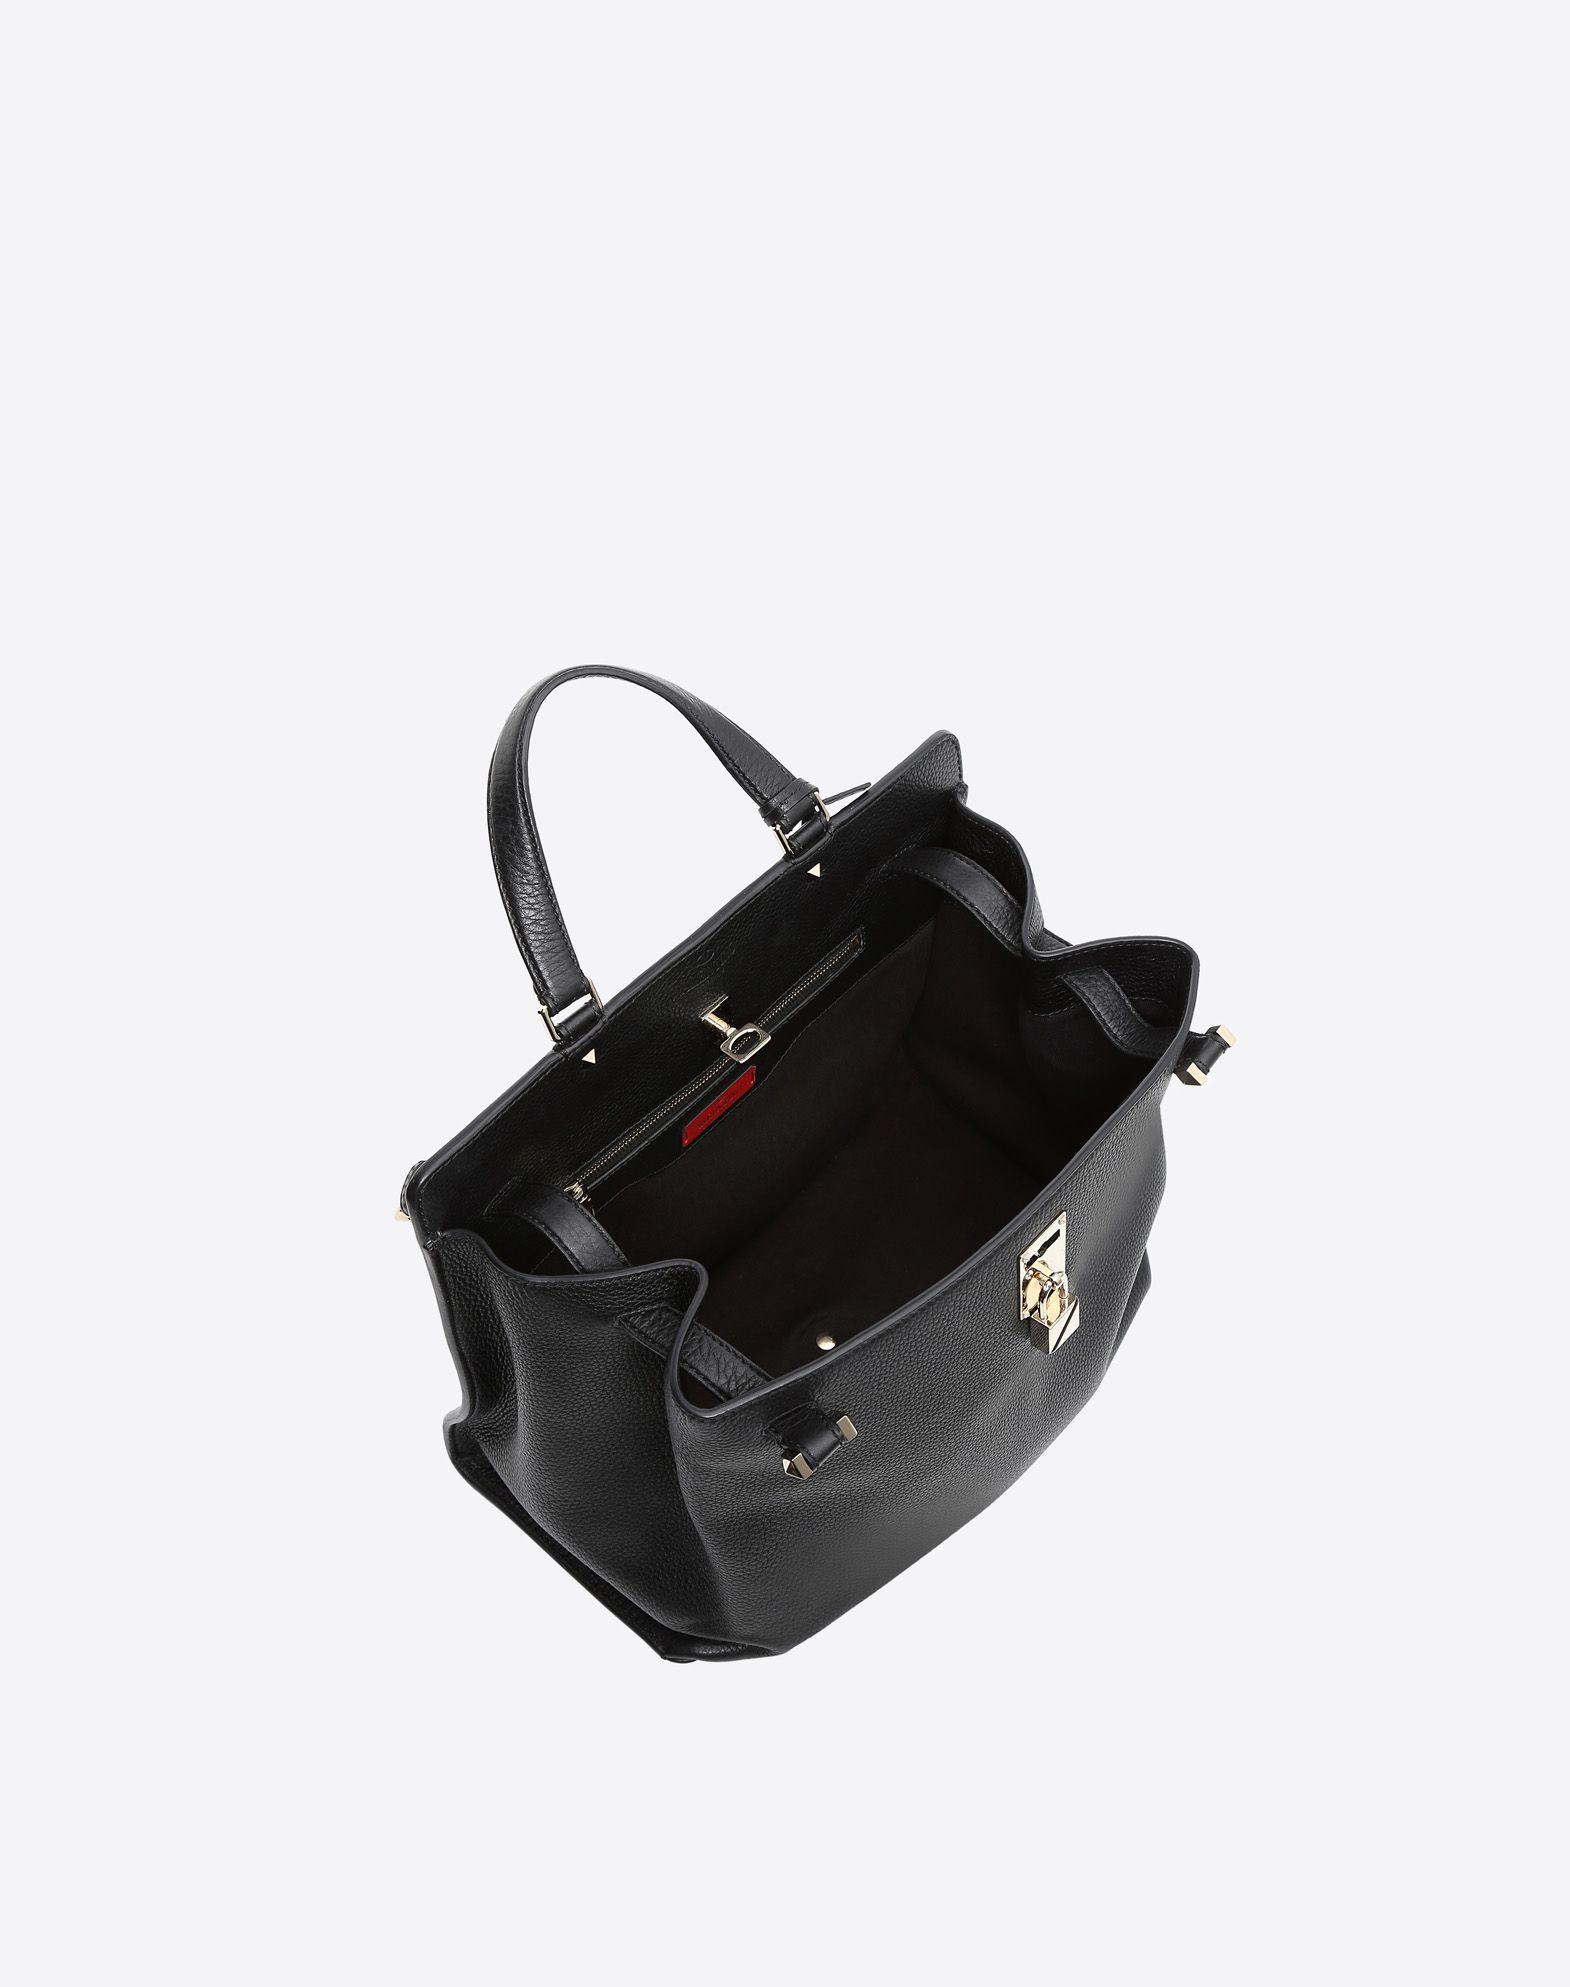 Valentino Garavani Bags